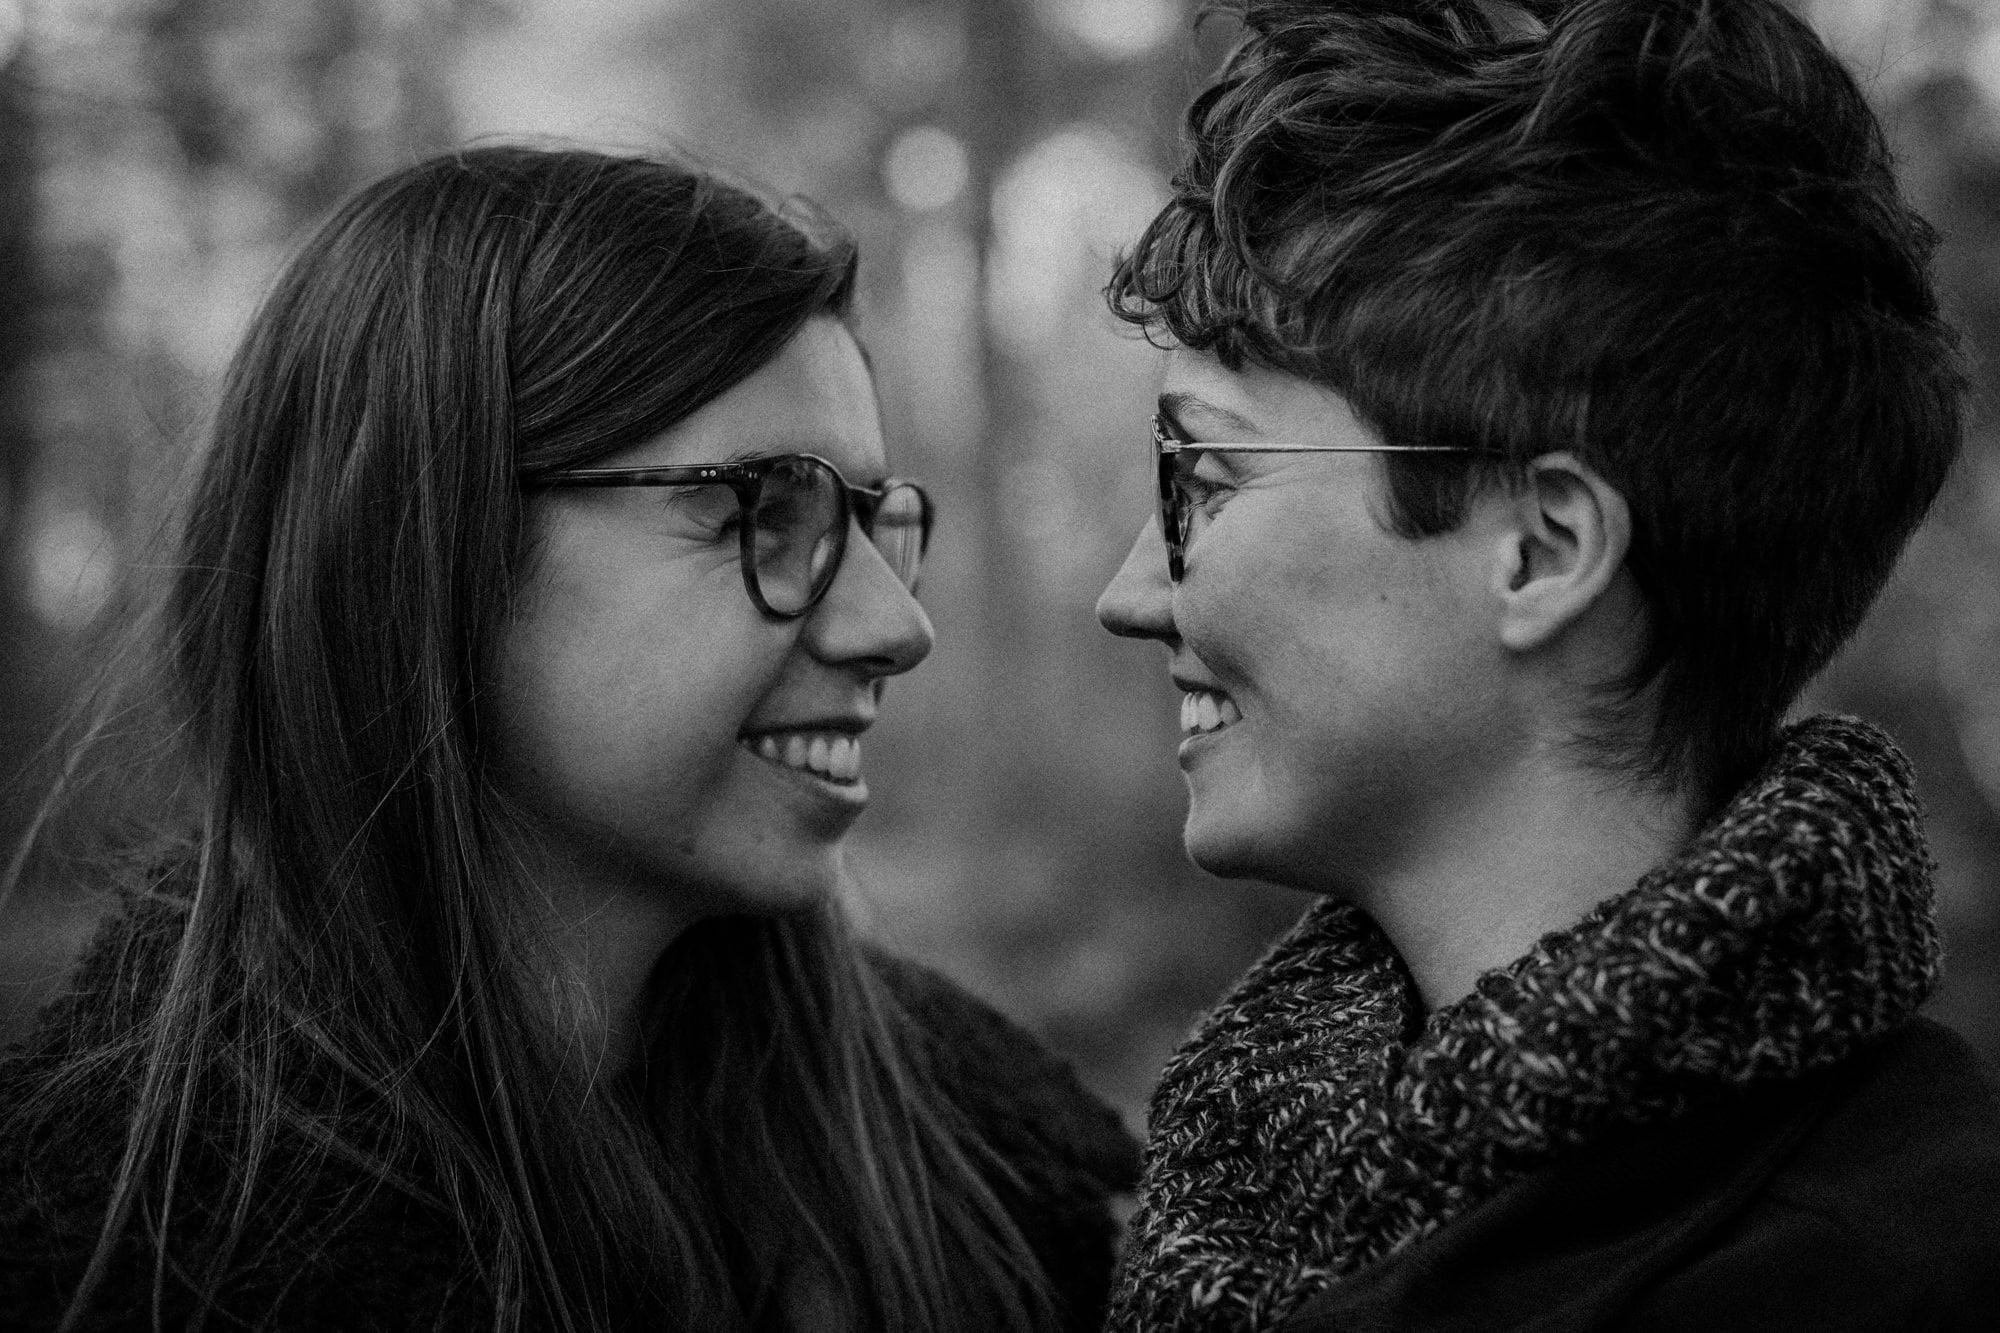 Tentsmuir Forest Pre-wedding Photo Session, Same-sex couple pre-wedding photoshoot Scotland